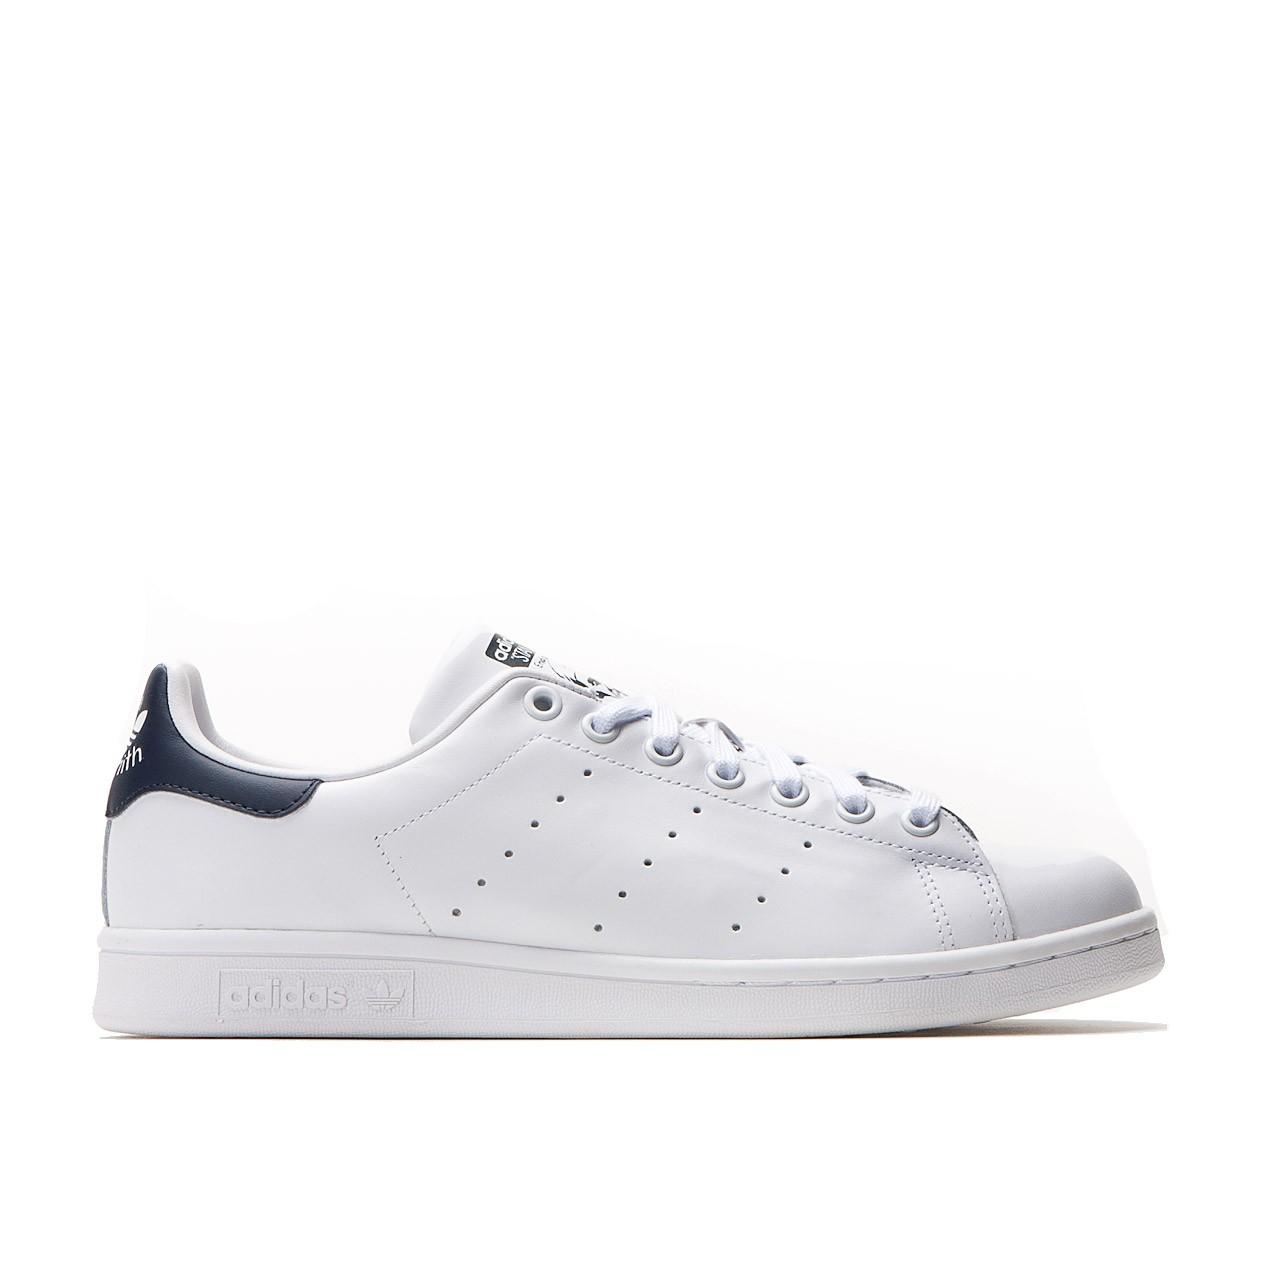 lowest price 55acf 3de9a adidas stan smith new navy